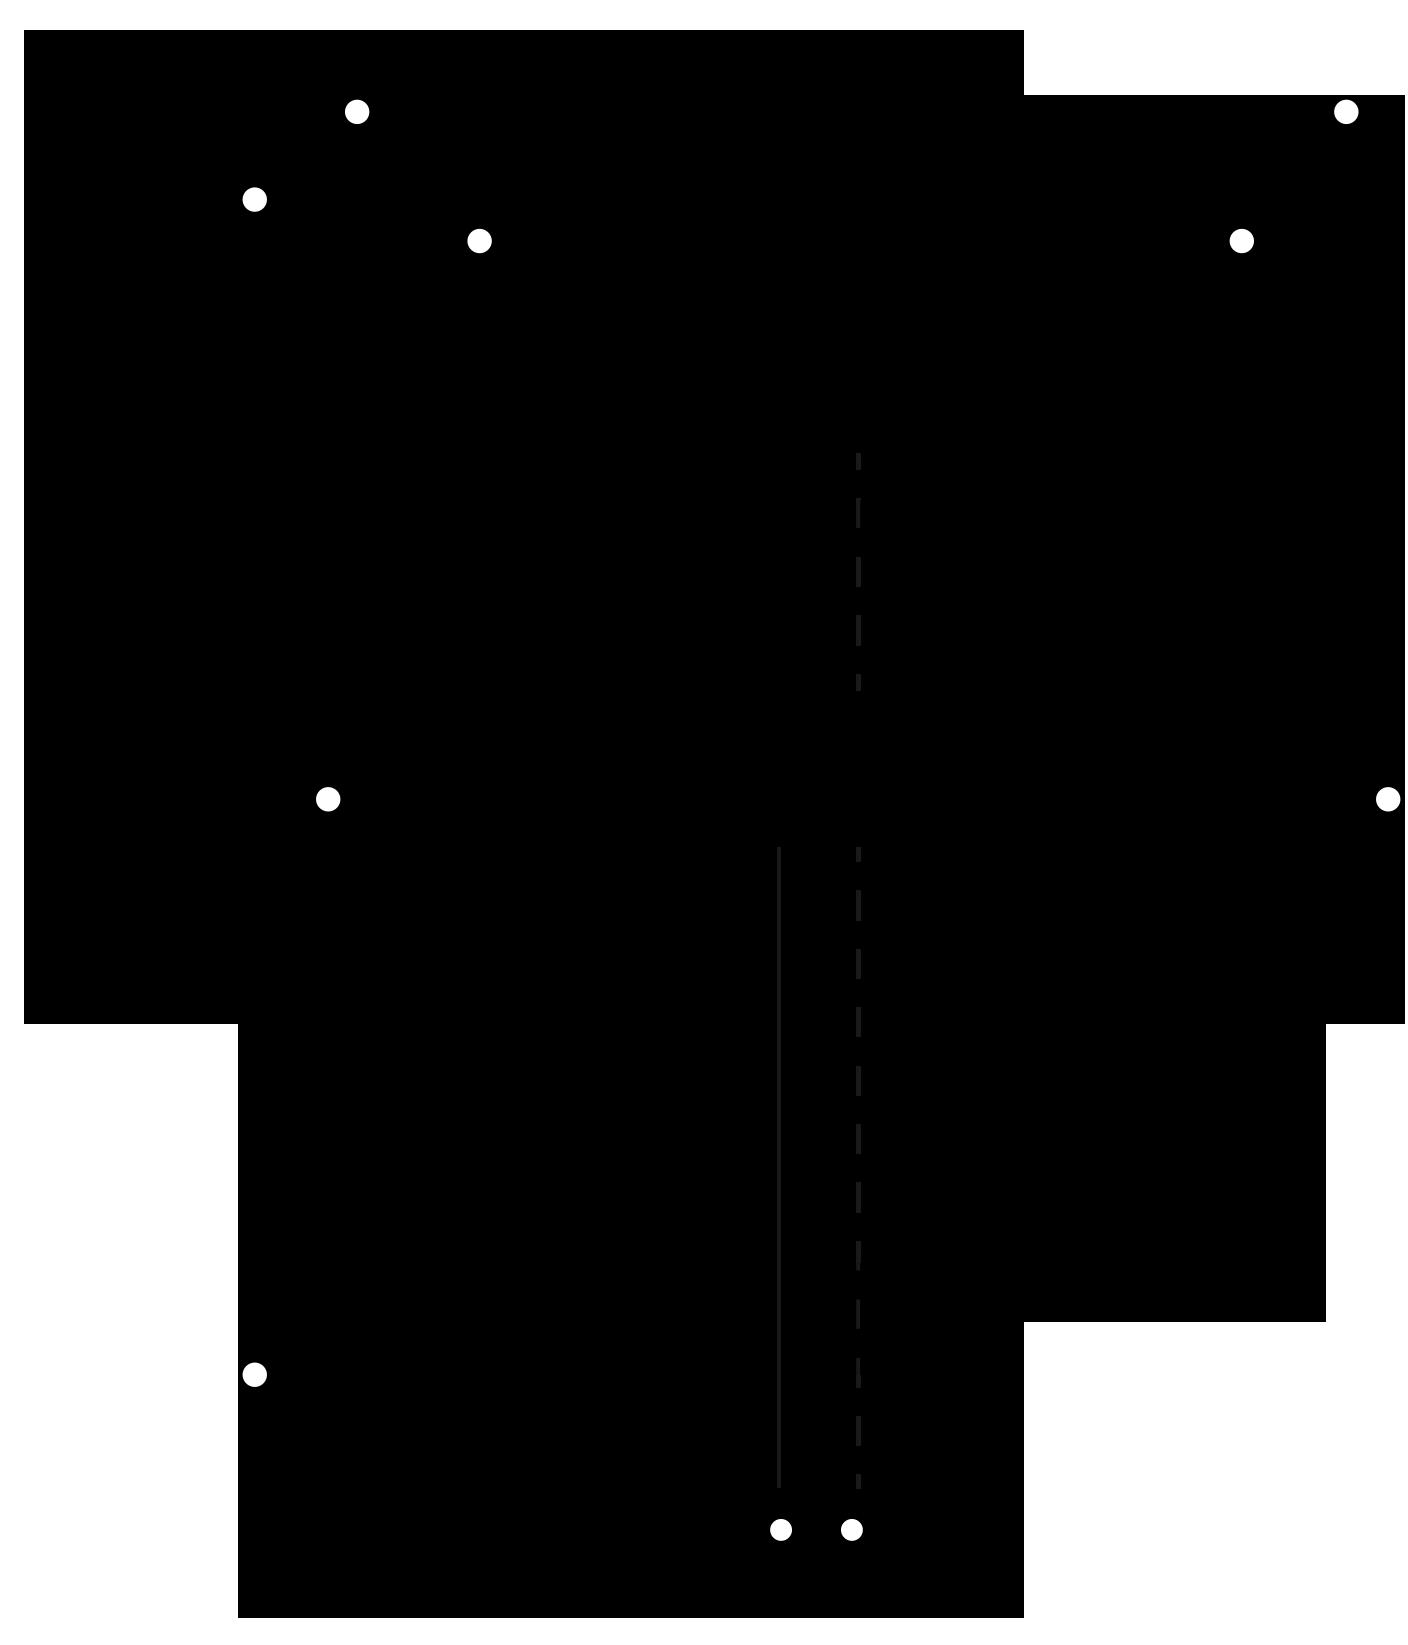 RAR EVEN GX35 650b